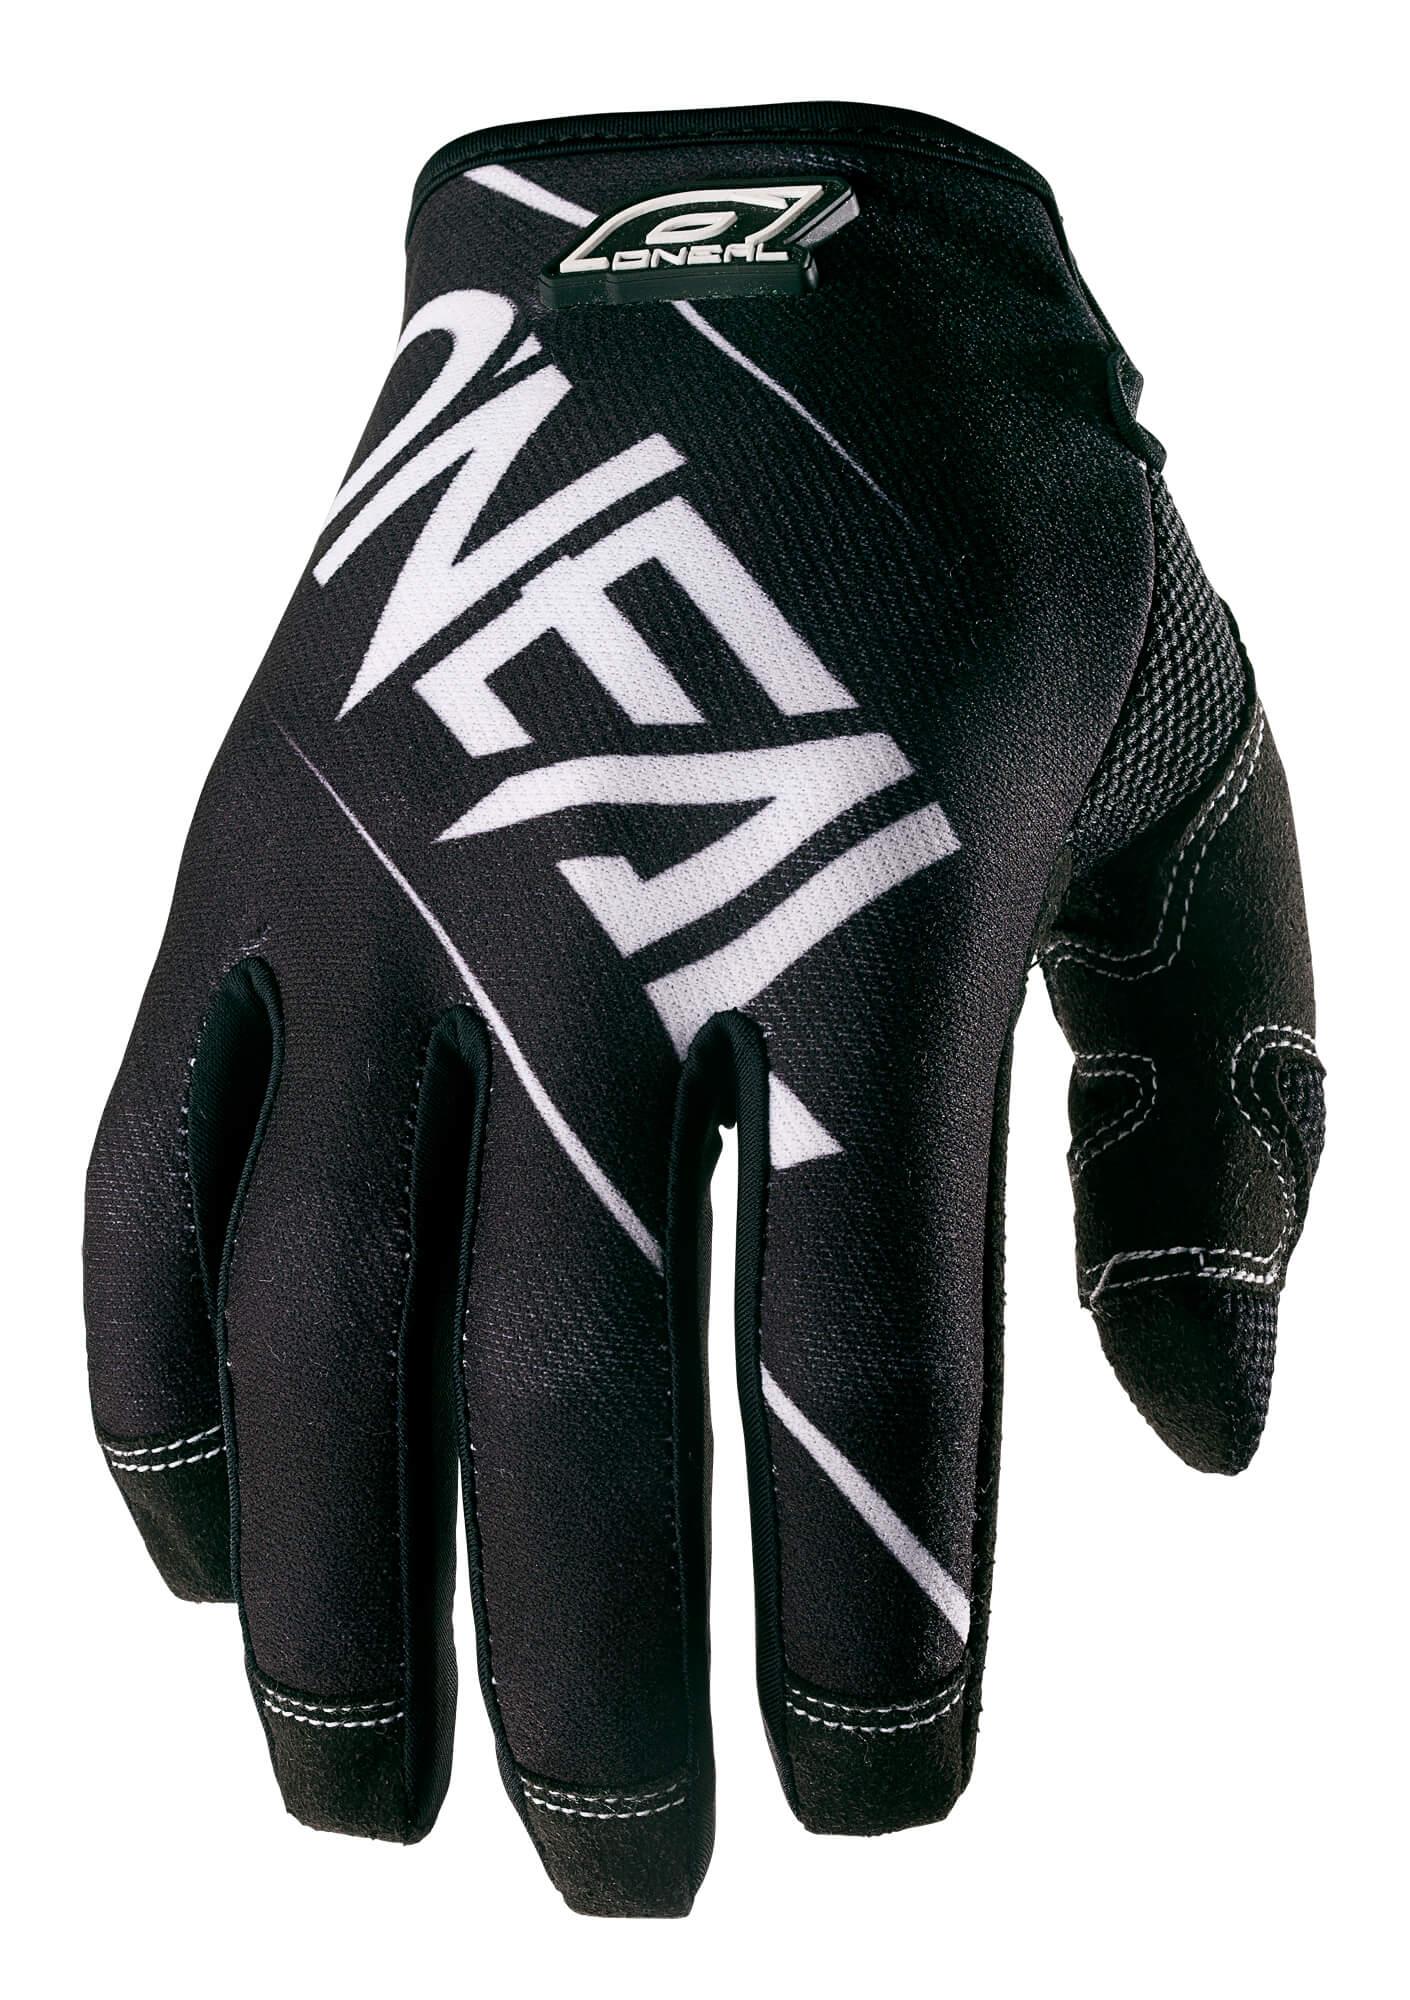 ONeal 2017 Jump Mayhem Glove Blocker Black